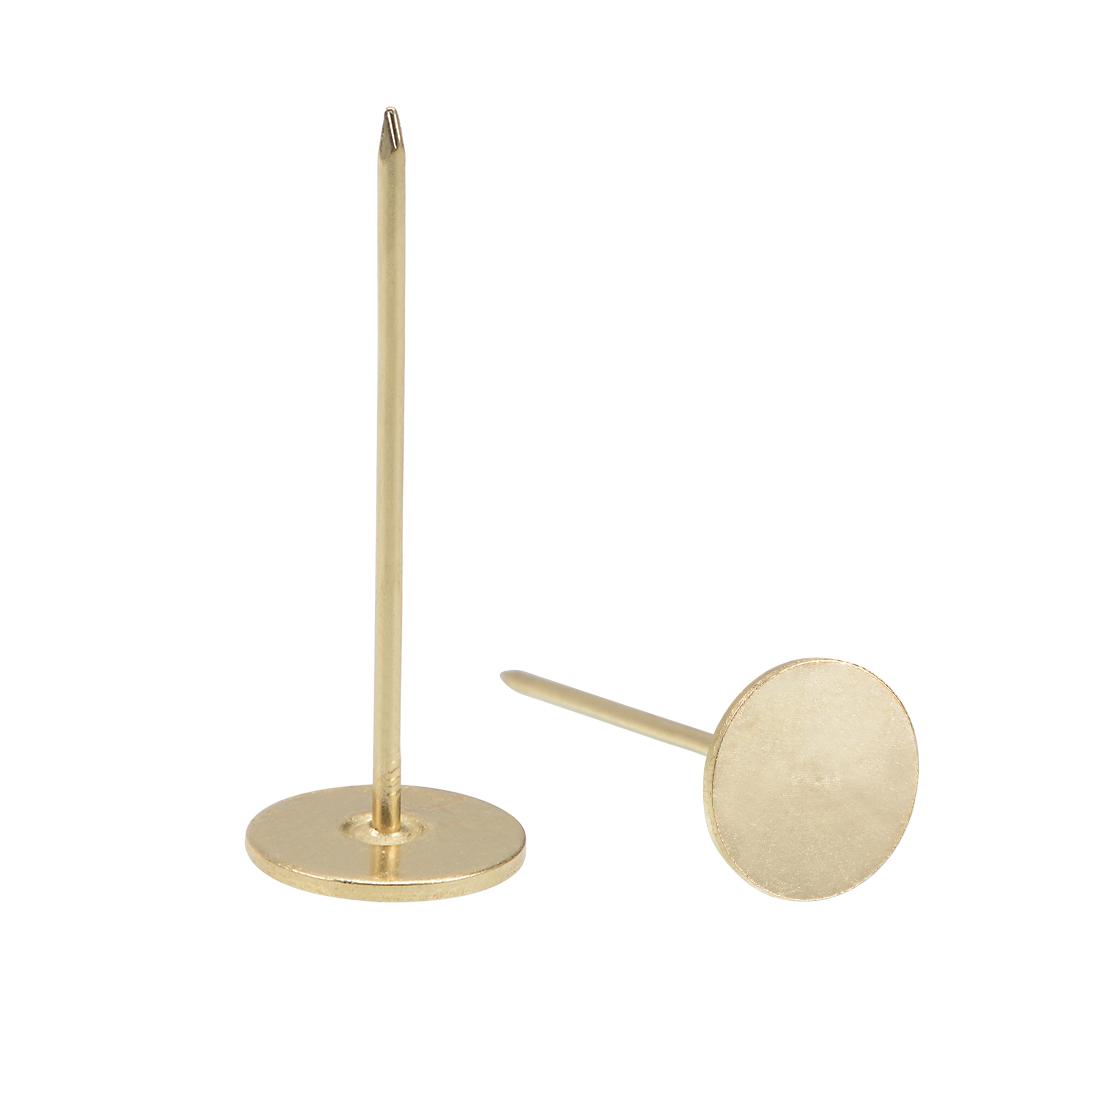 Upholstery Nails Tacks 18mmx50mm Flat Head Furniture Nails Gold Tone 80 Pcs